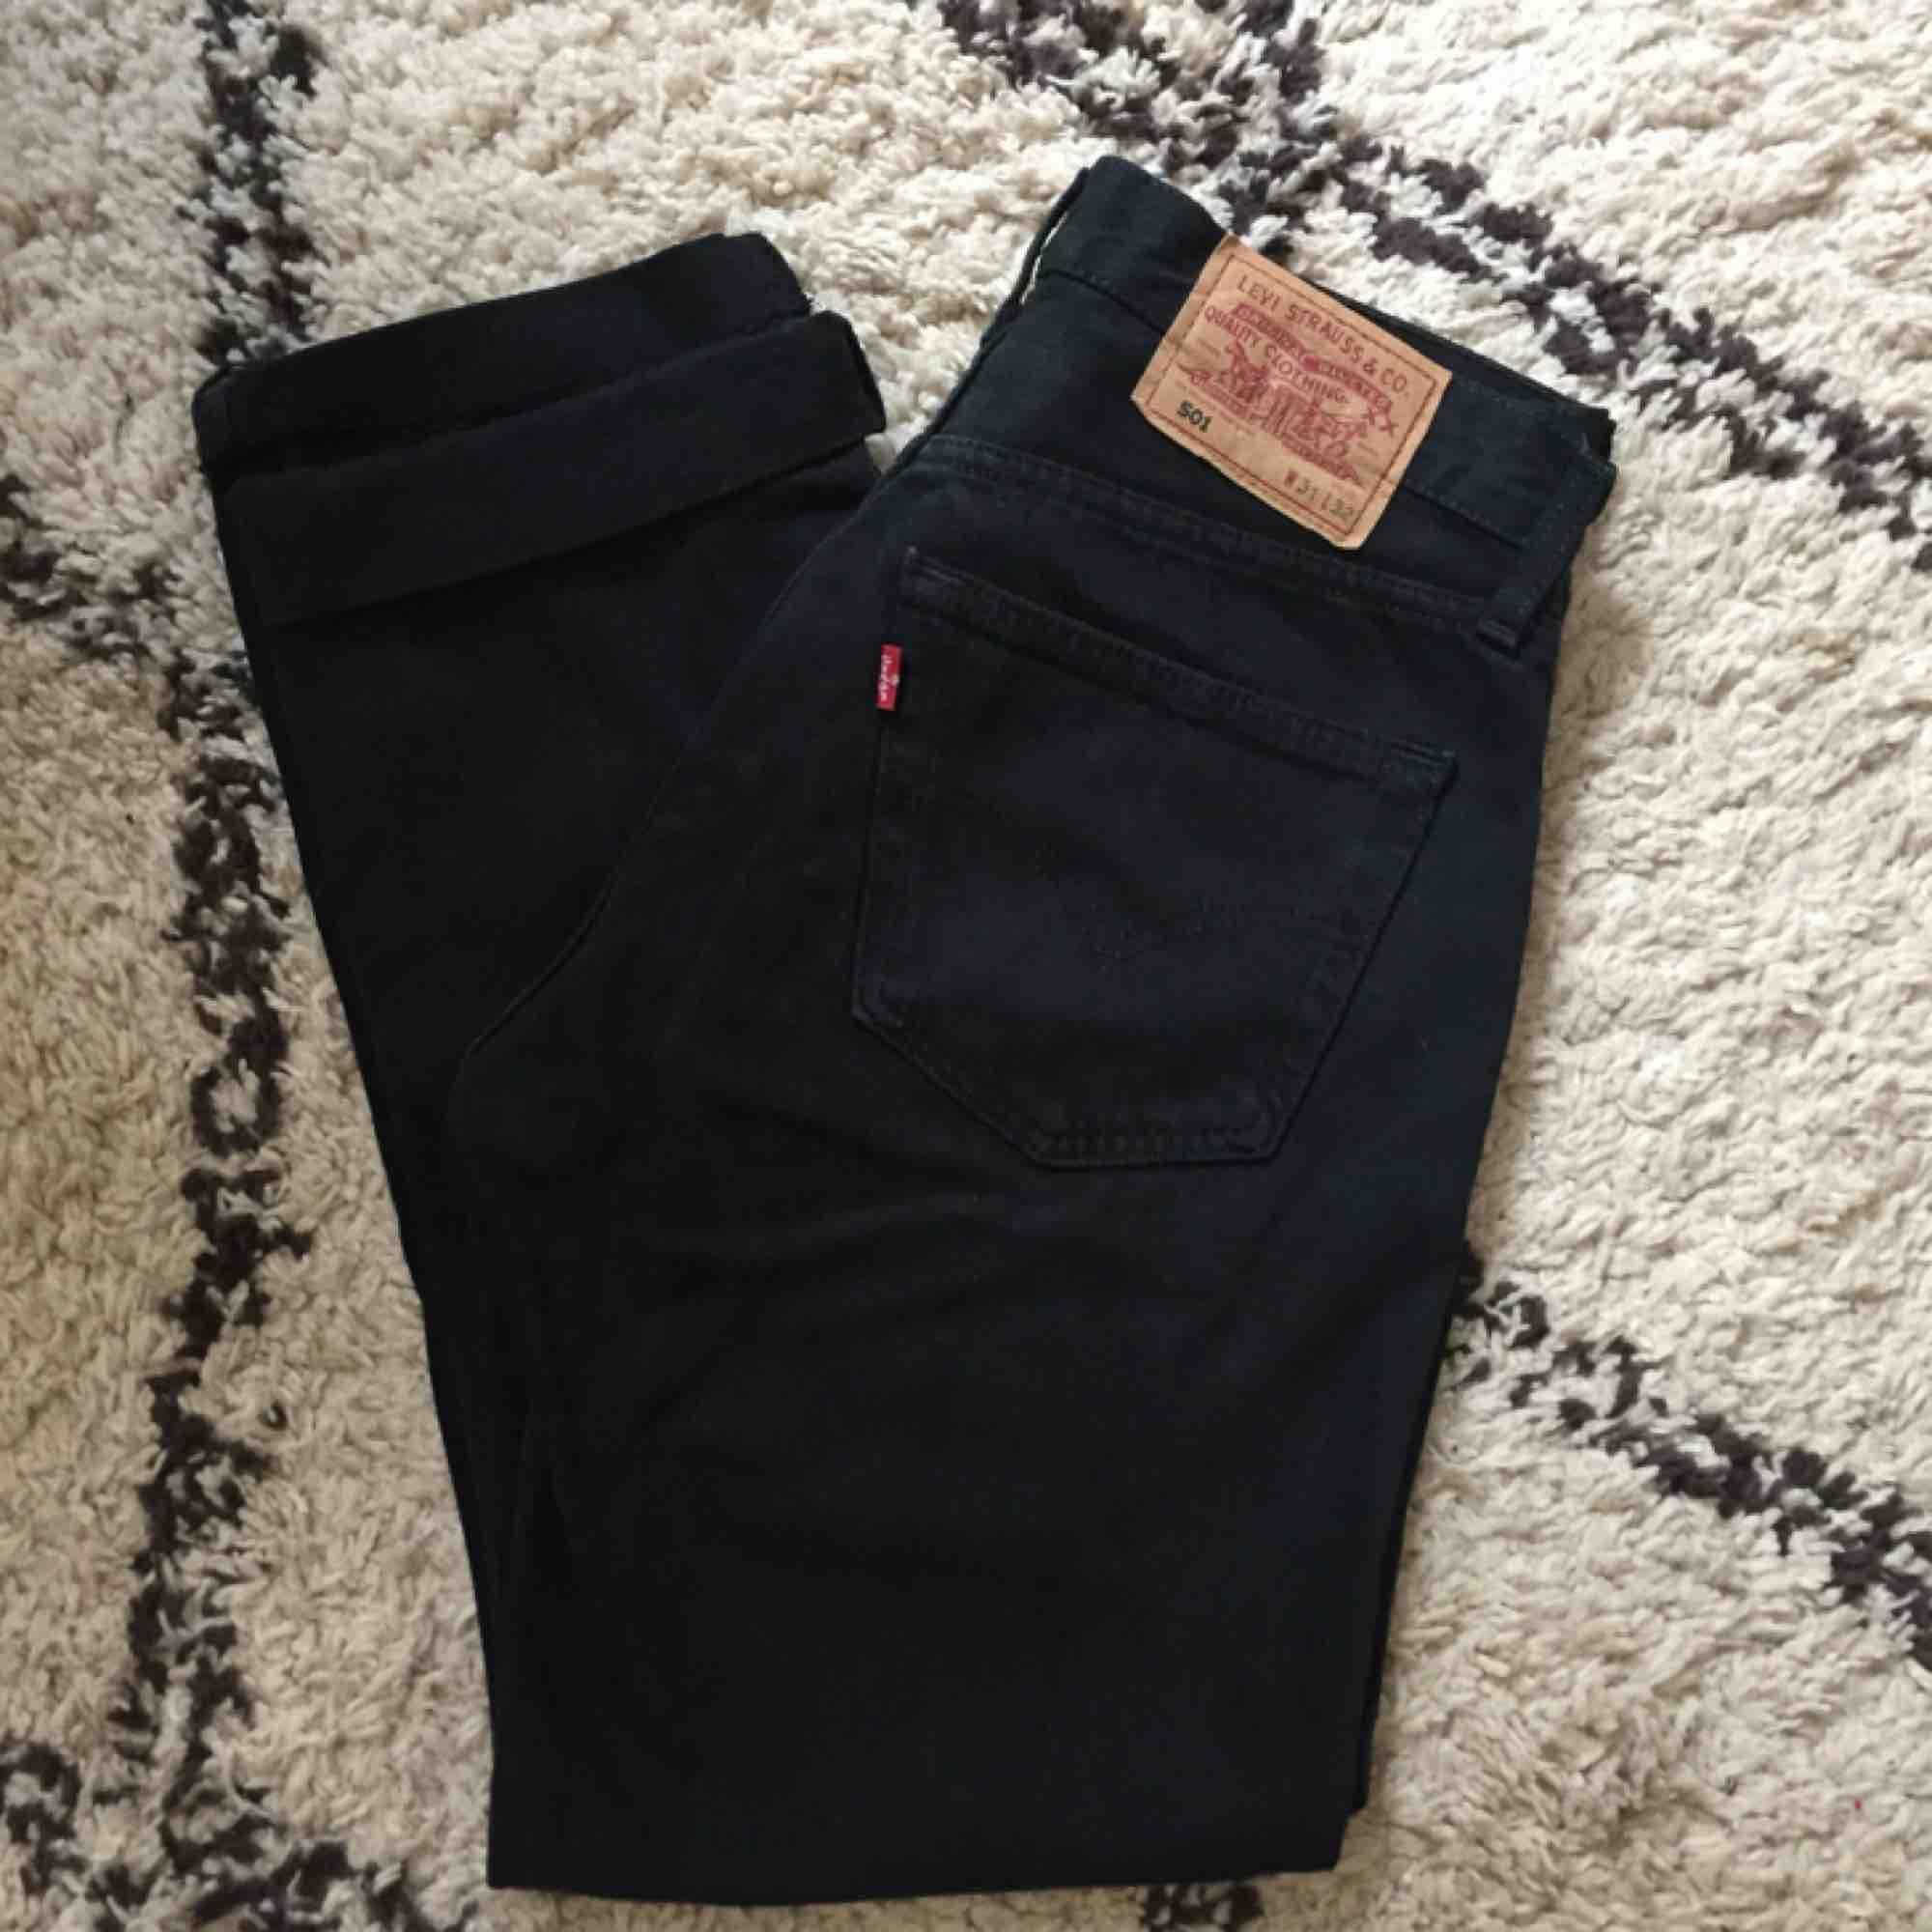 Svarta levis vintage jeans. Stl 31, motsvarar ca en 28/29a. Fint skick, inga slitningar. Avklippta. . Jeans & Byxor.